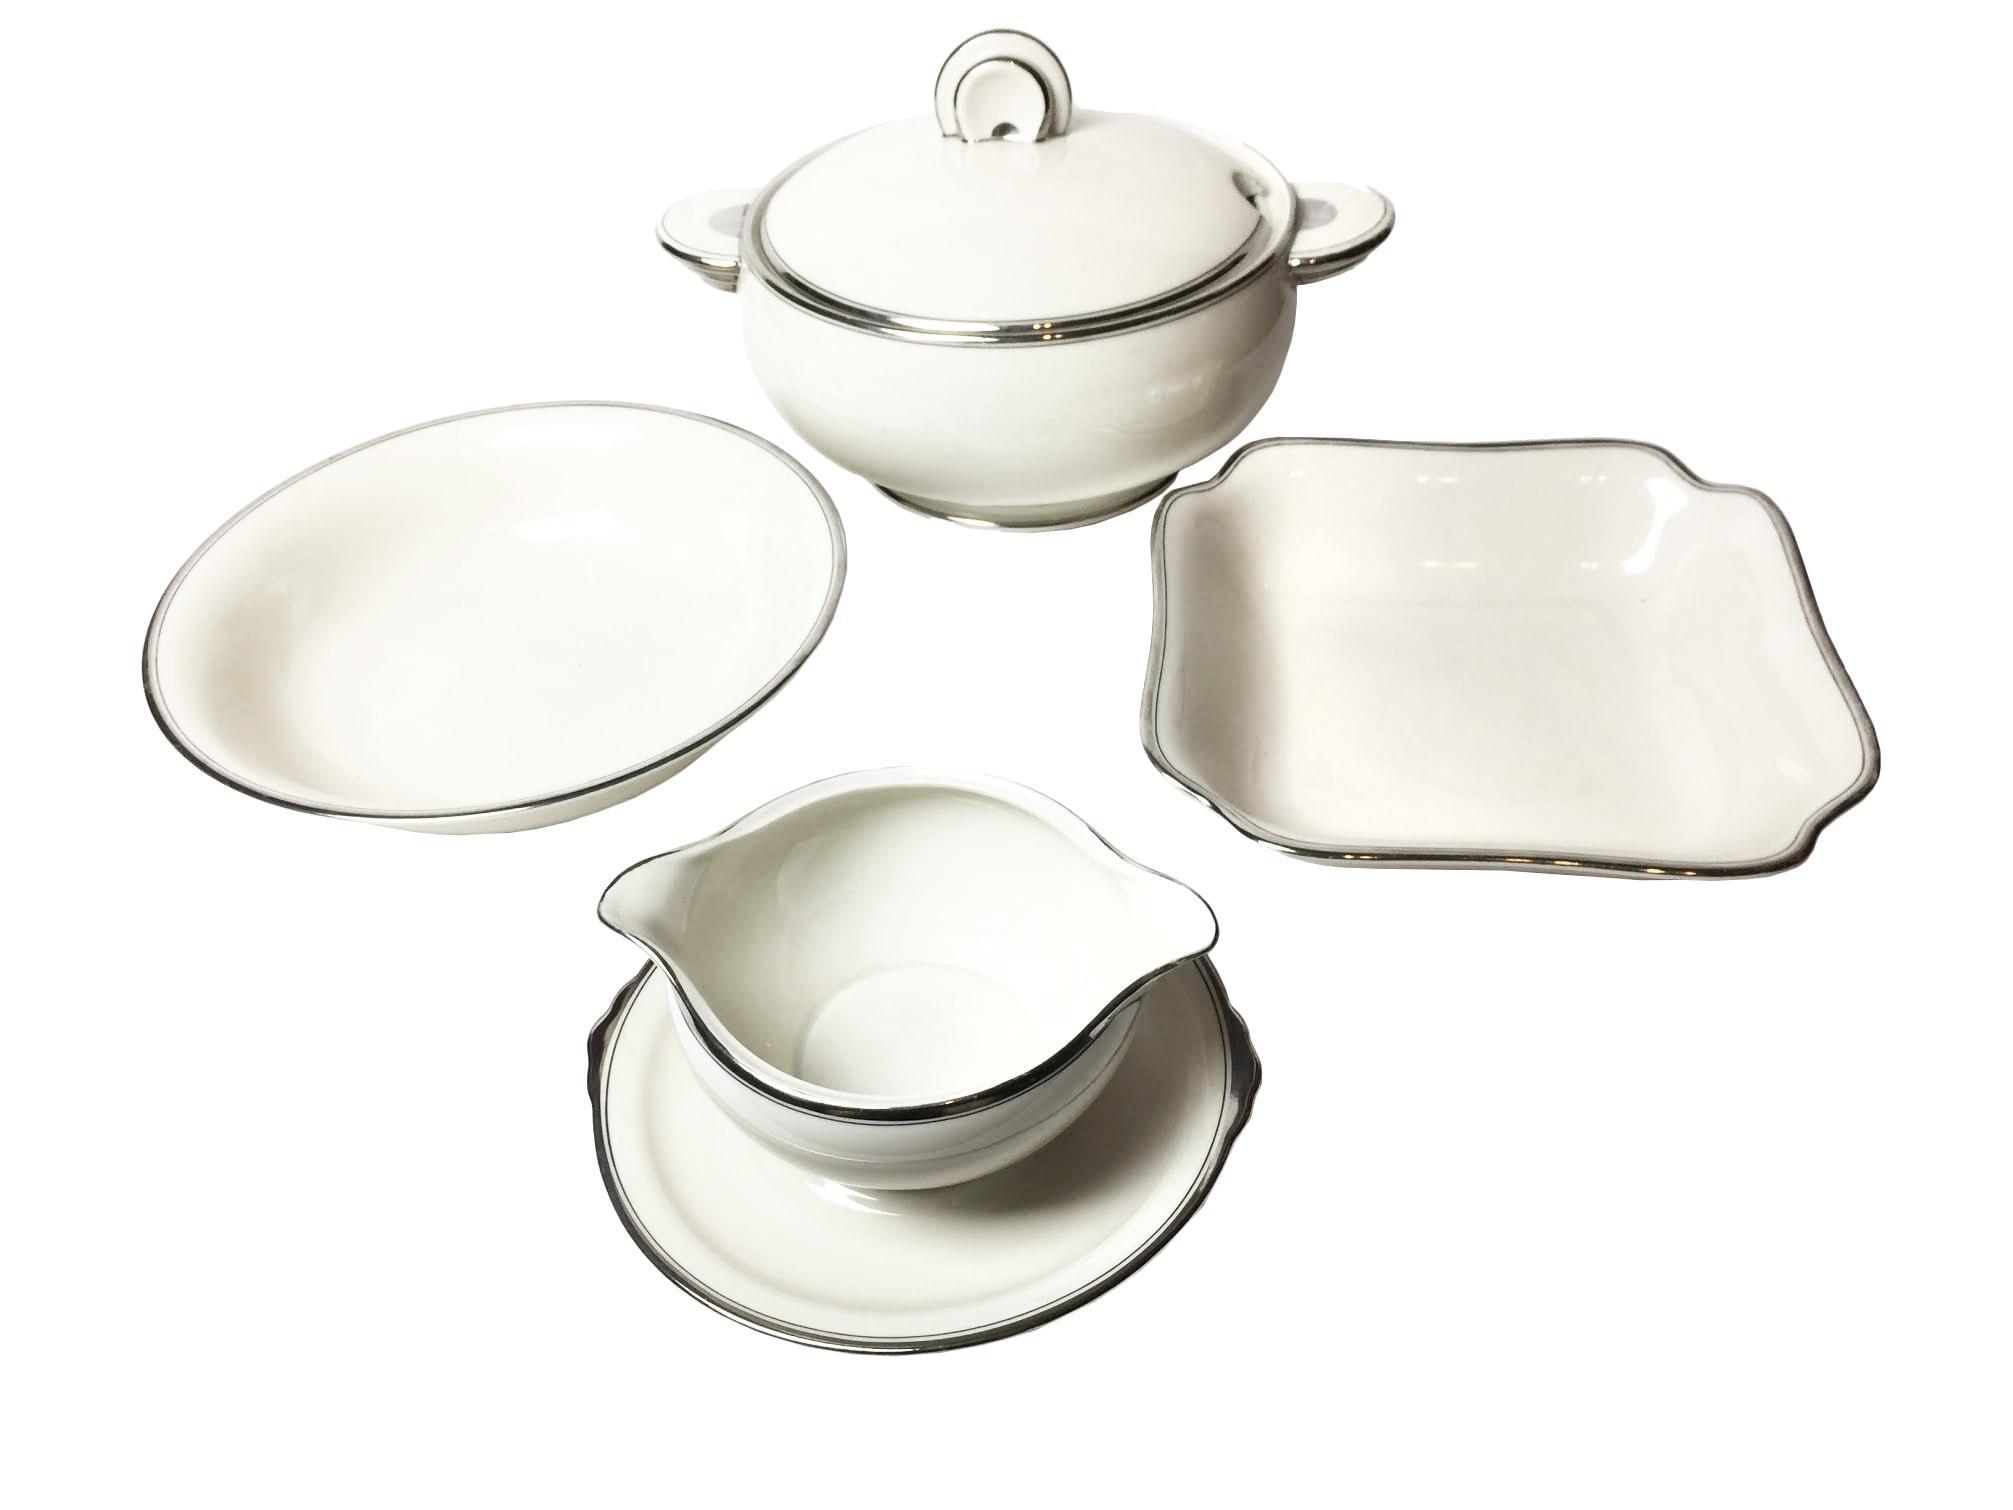 1920s Vintage Art Deco Style White \u0026 Silver Dinnerware Set - 22 Pieces - Image 2  sc 1 st  Chairish & 1920s Vintage Art Deco Style White \u0026 Silver Dinnerware Set - 22 ...